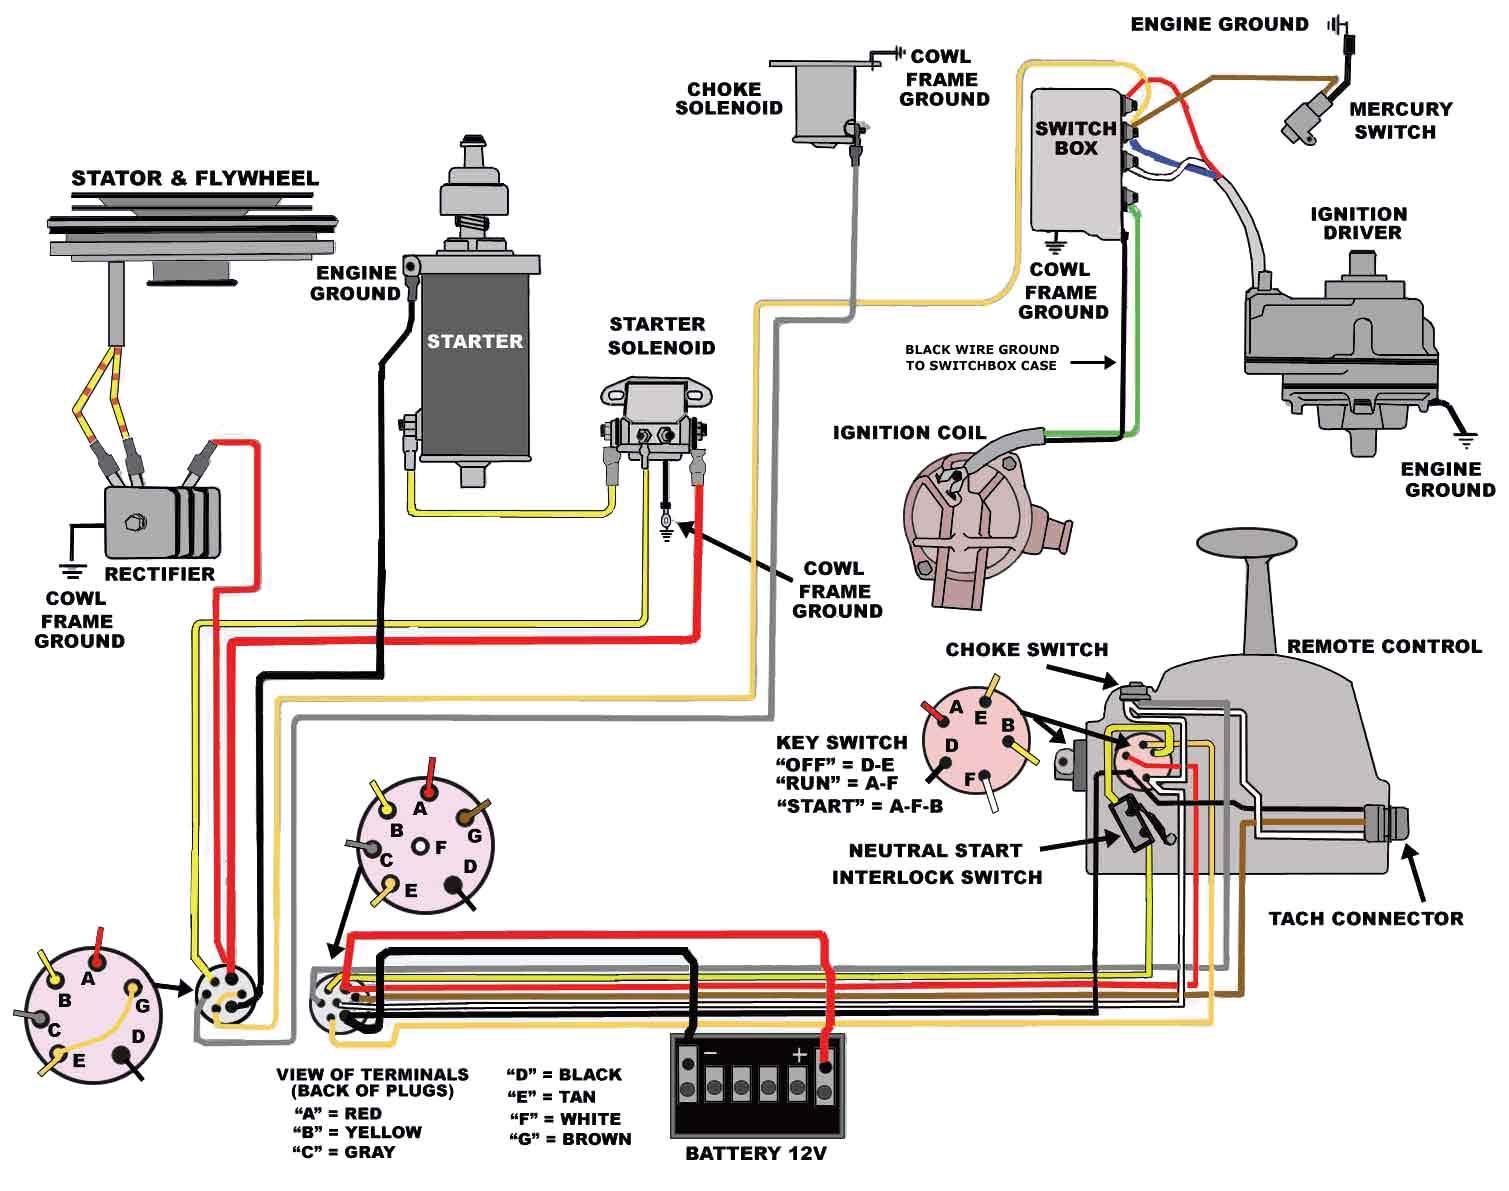 mercury wiring diagram mains powered smoke alarm uk outboard diagrams mastertech marin merc